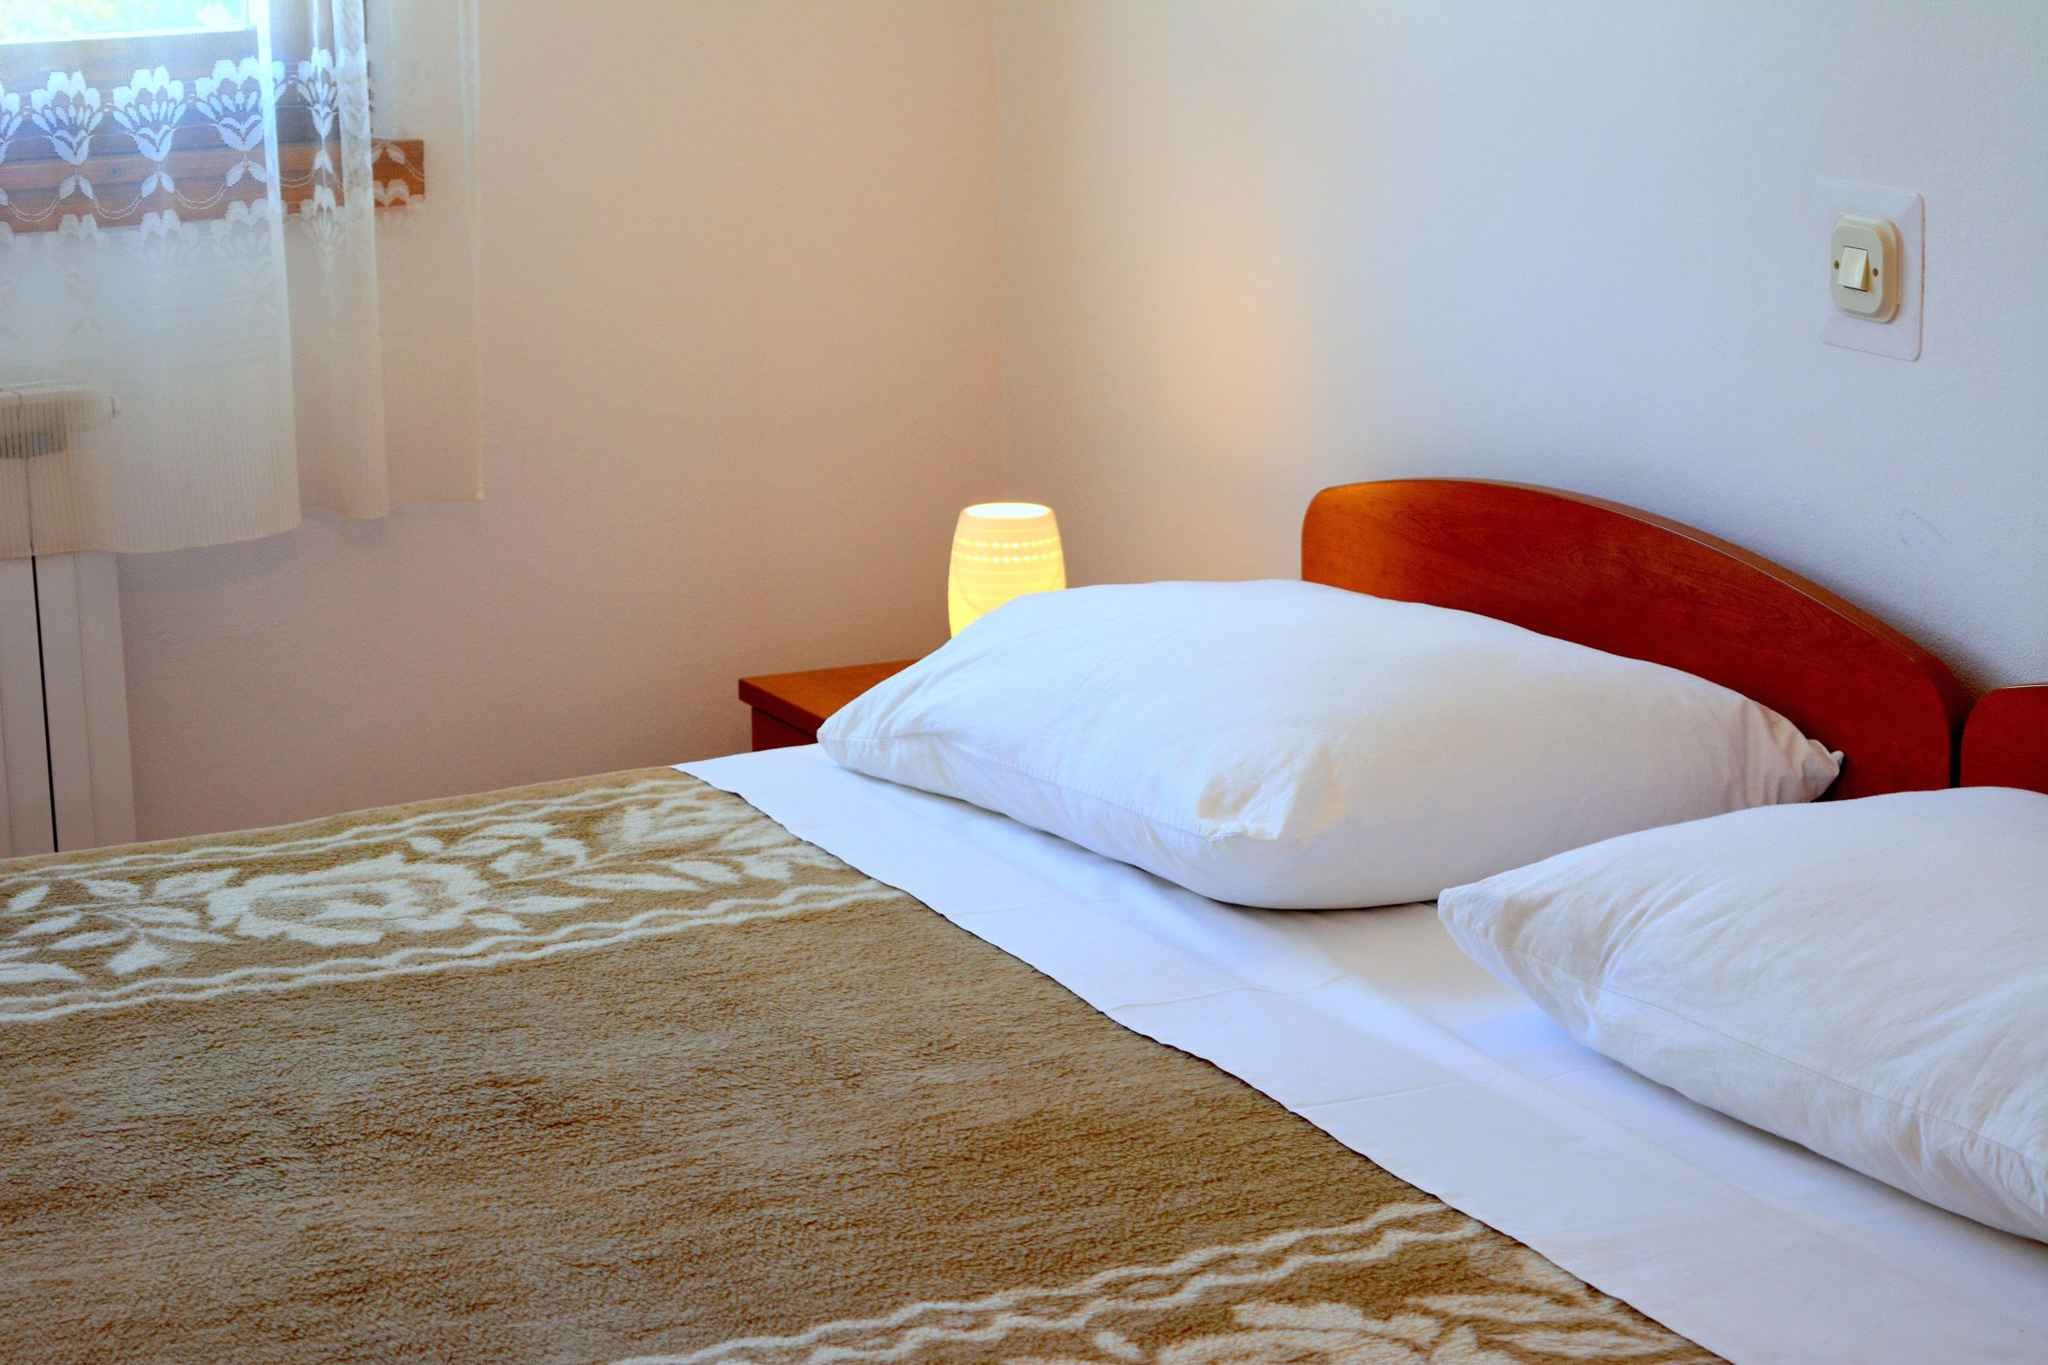 Appartement de vacances mit Terrasse (278775), Vodice, , Dalmatie, Croatie, image 13